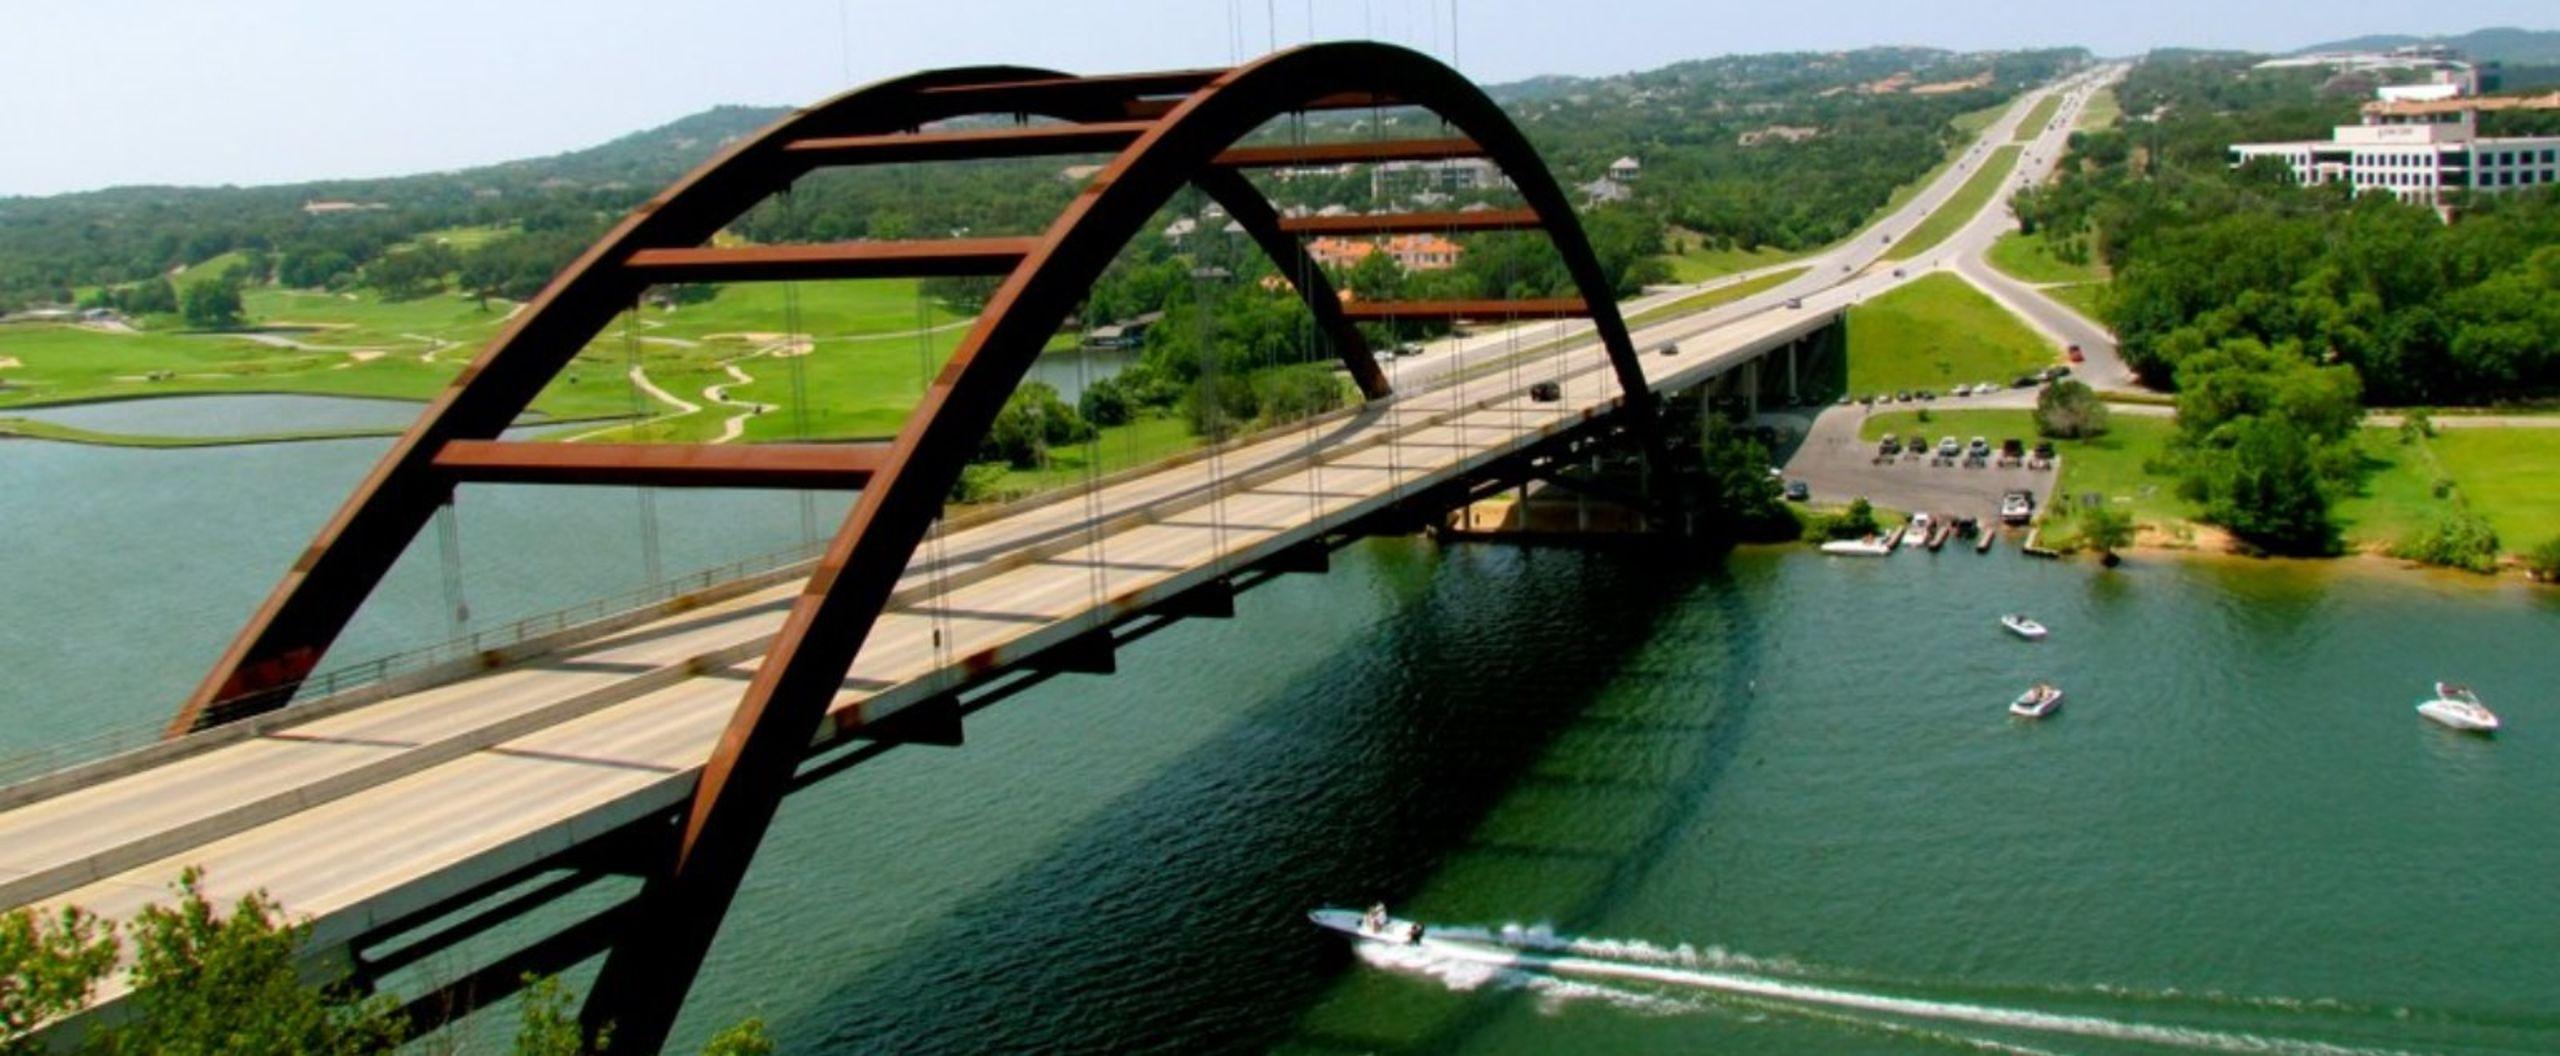 Austin Pennybacker Bridge Photo Courtesy of Jeff Gunn, Atlanta, USA